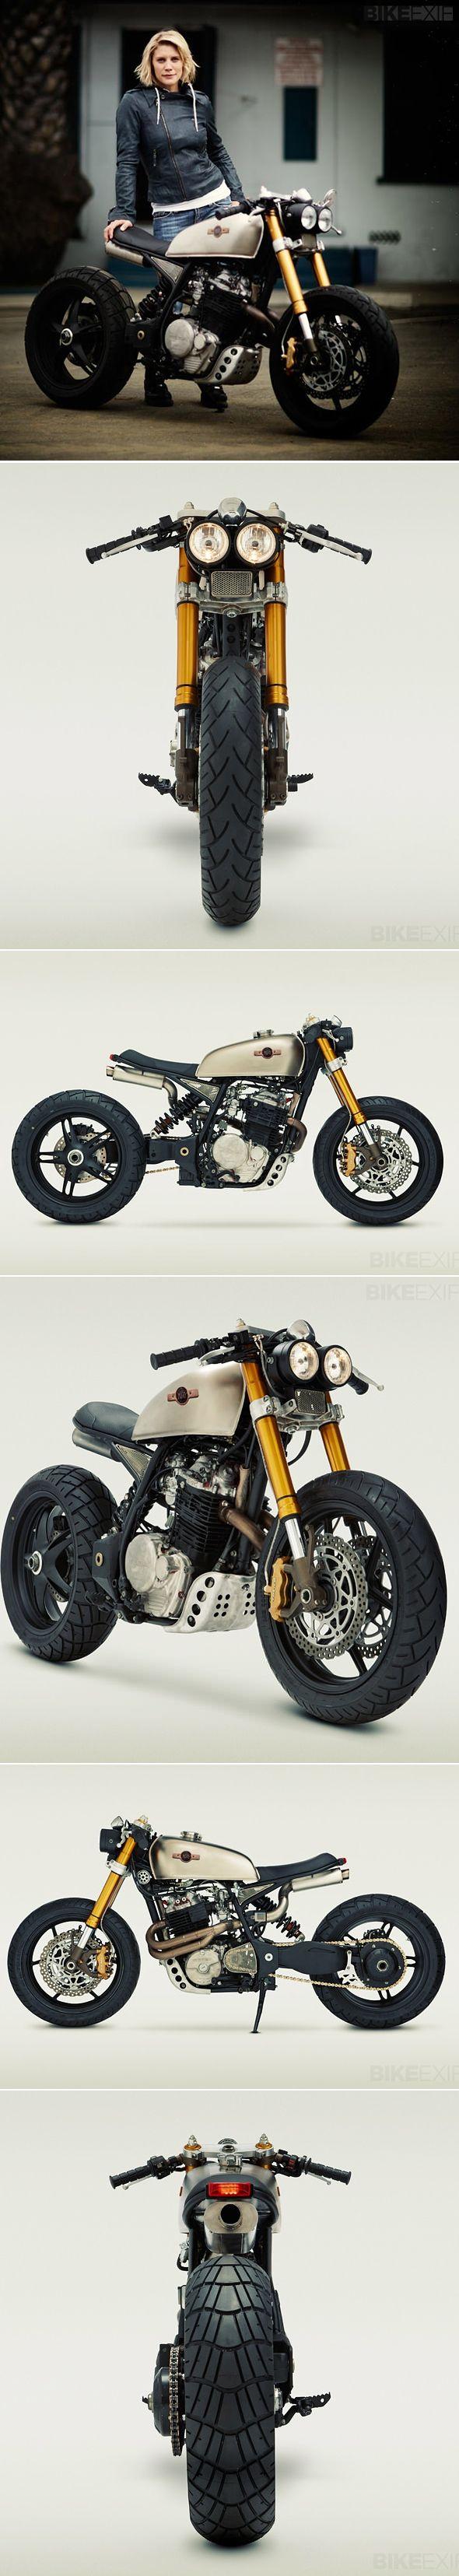 Moto-custom-par-Classified-Moto-2